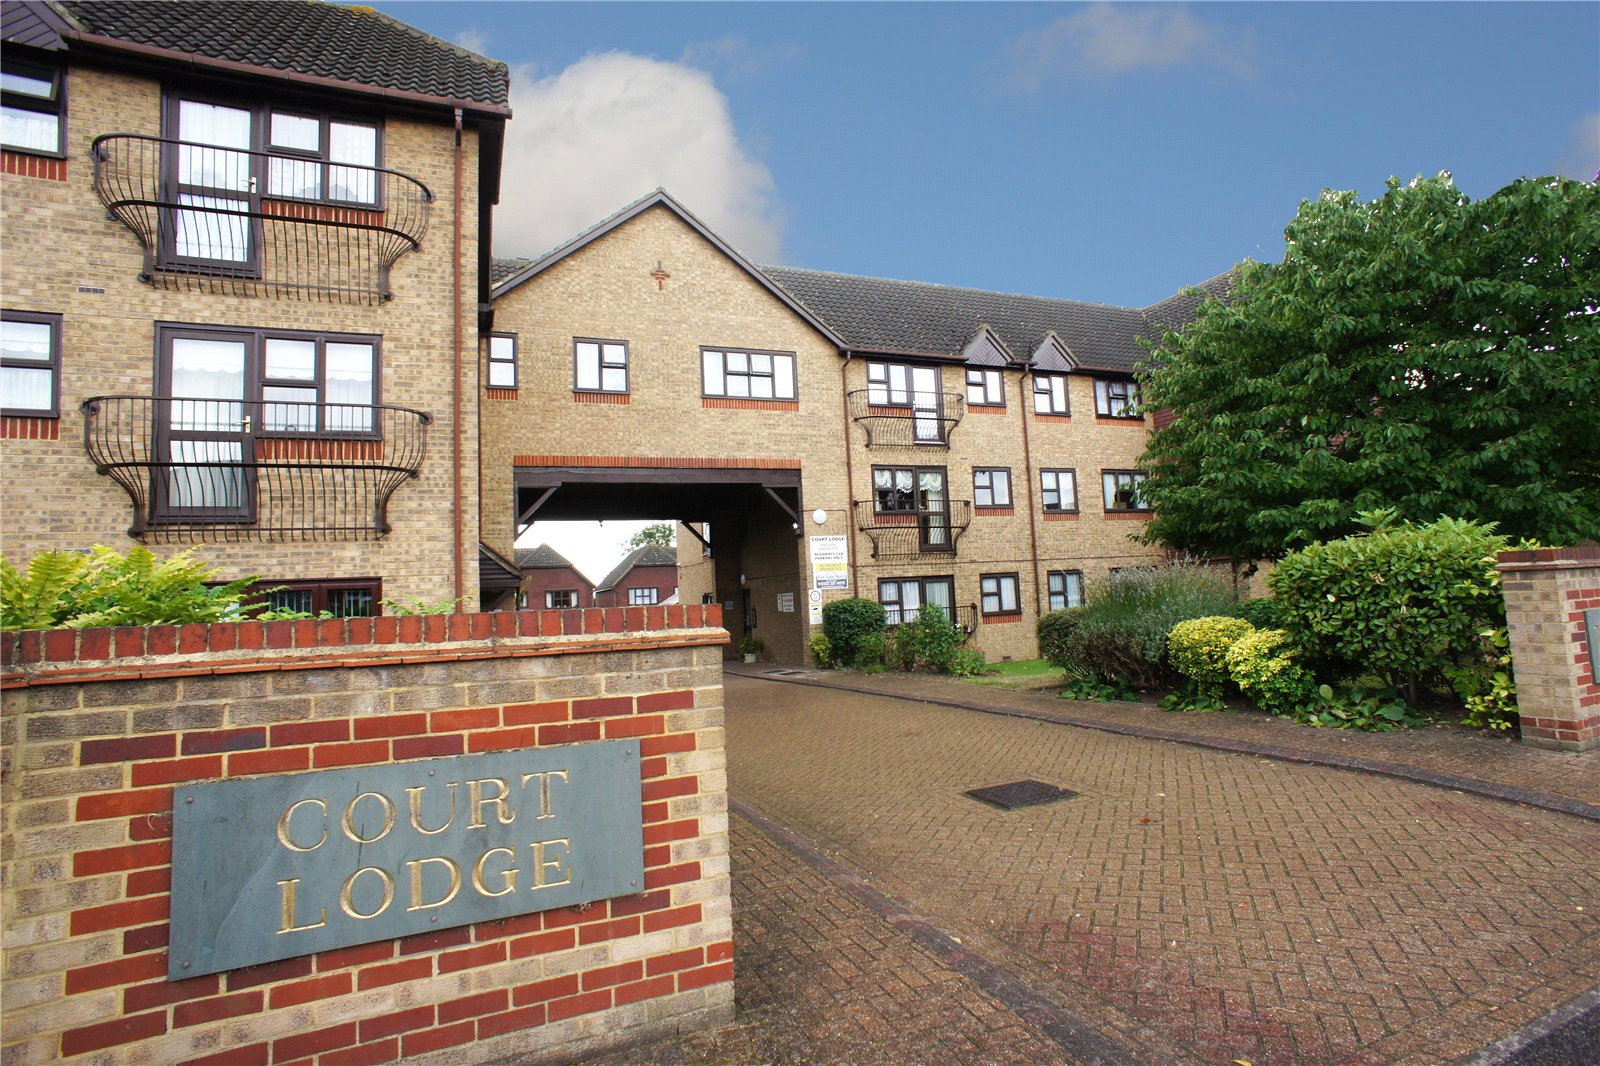 Court Lodge, Erith Road, Belvedere, Kent, DA17